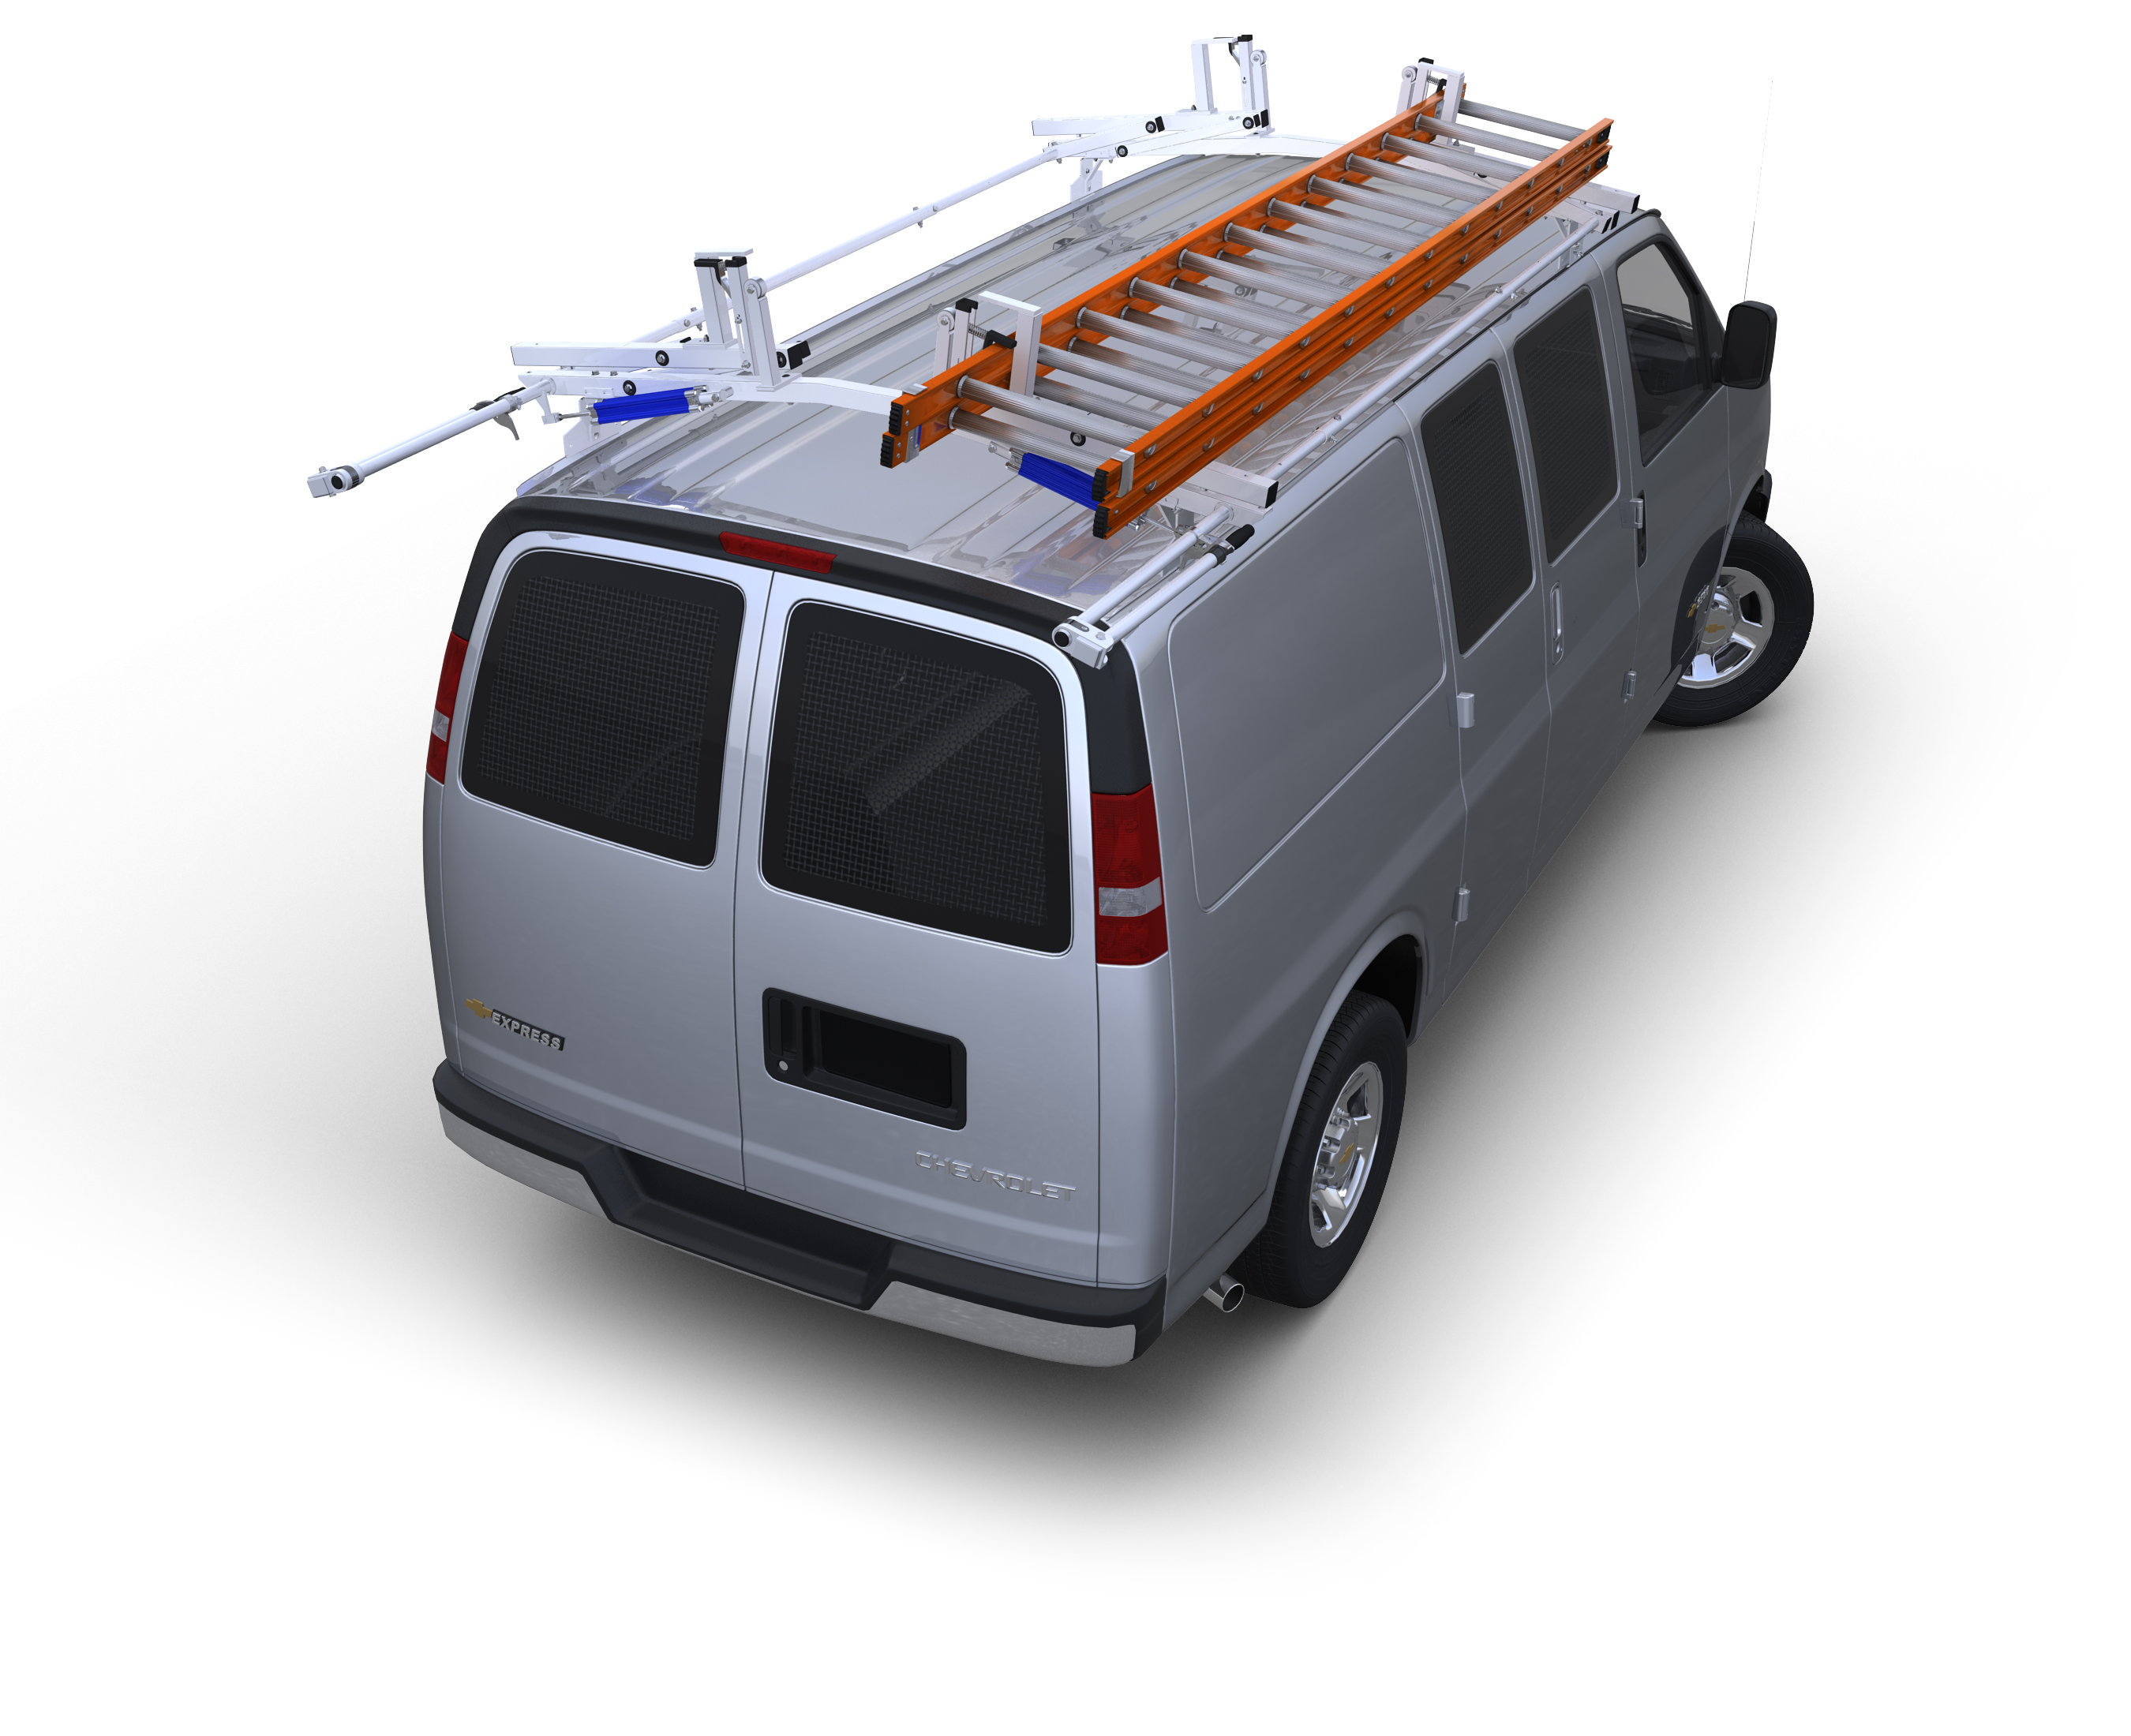 The All Aluminum AluRack™ Cargo Carrier for Ford Transit Vans